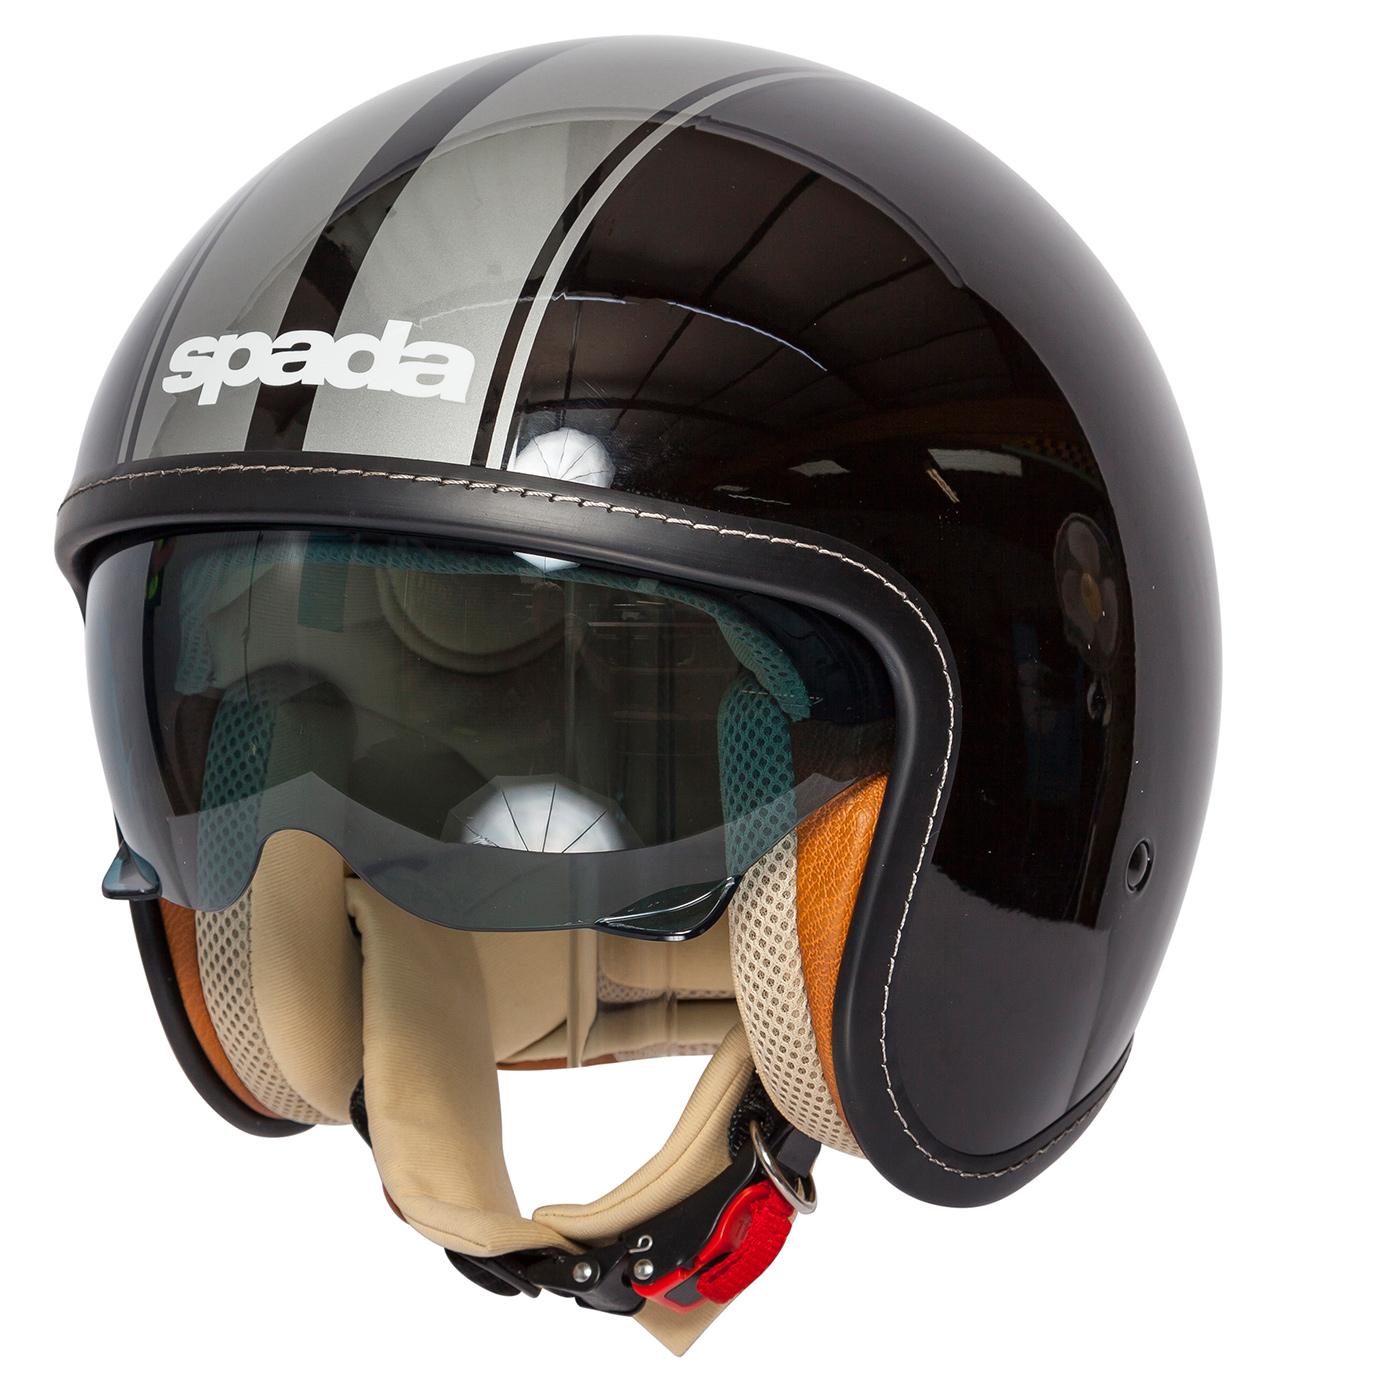 Spada Raze Motorcycle Motorbike Open Face Sun Visor Helmet Gloss Black